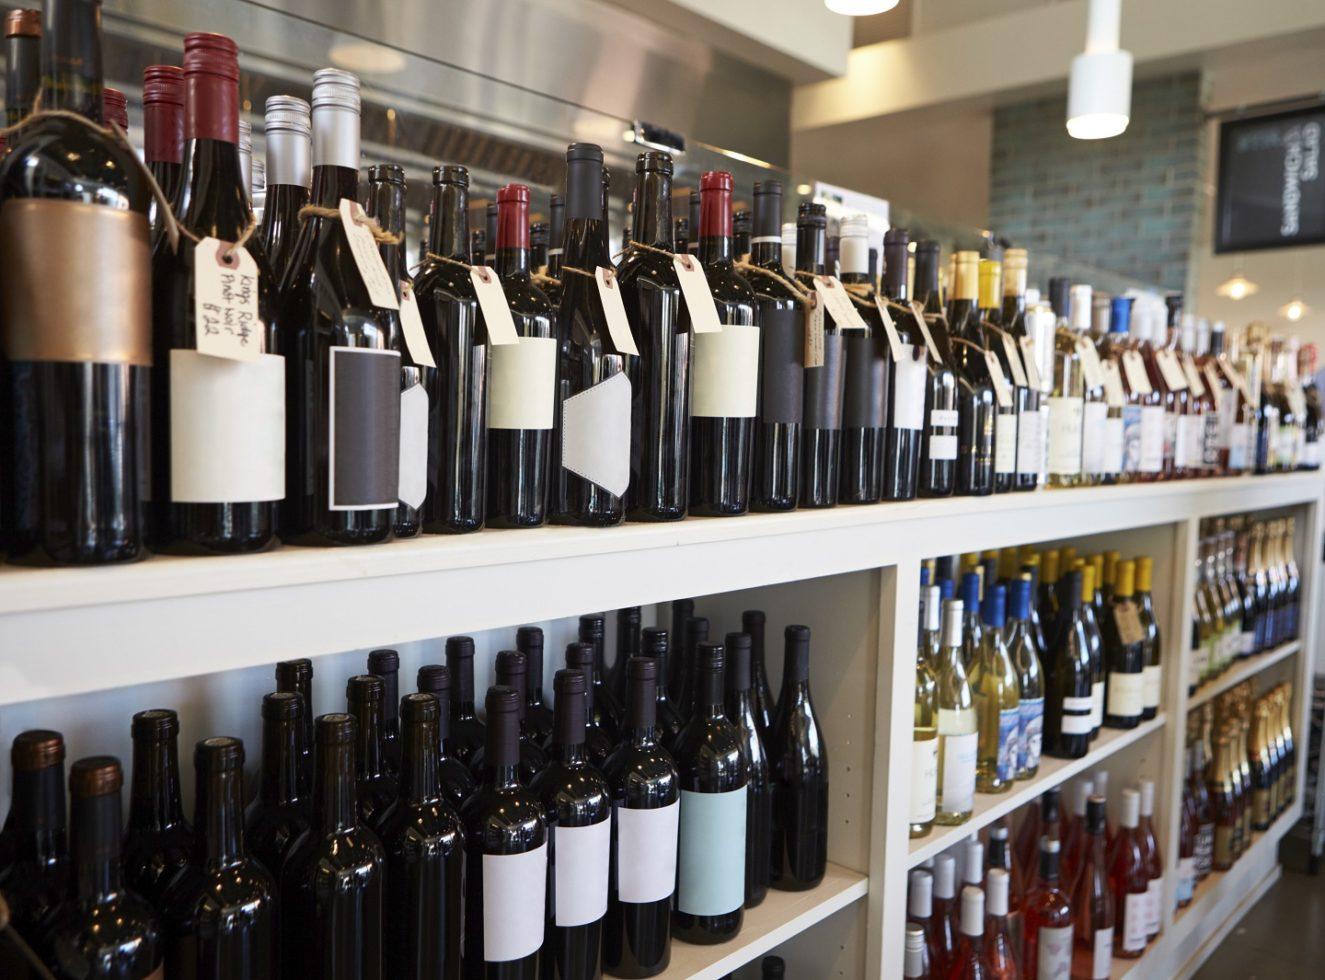 Wine store shelving in Australia